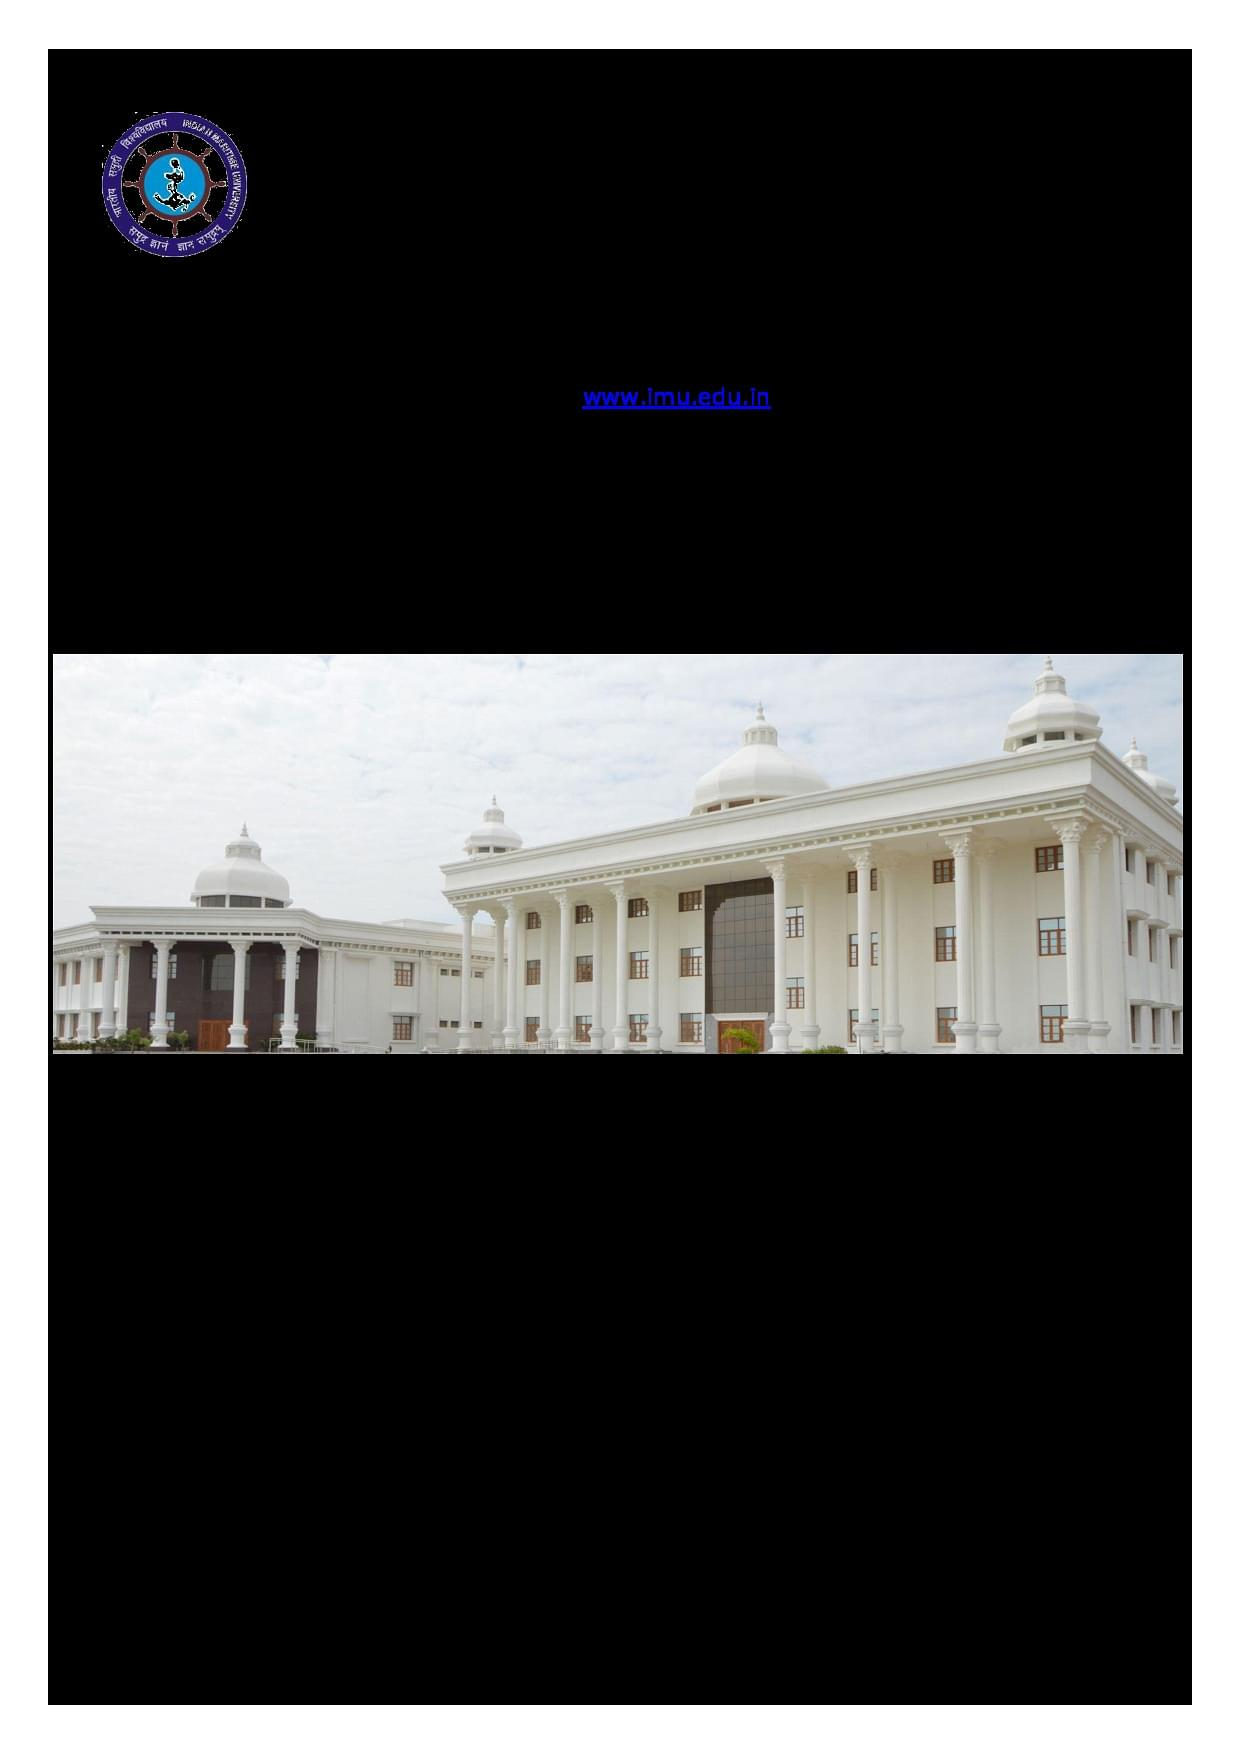 Coimbatore Marine College - [CMC], Coimbatore - Admissions, Contact ...